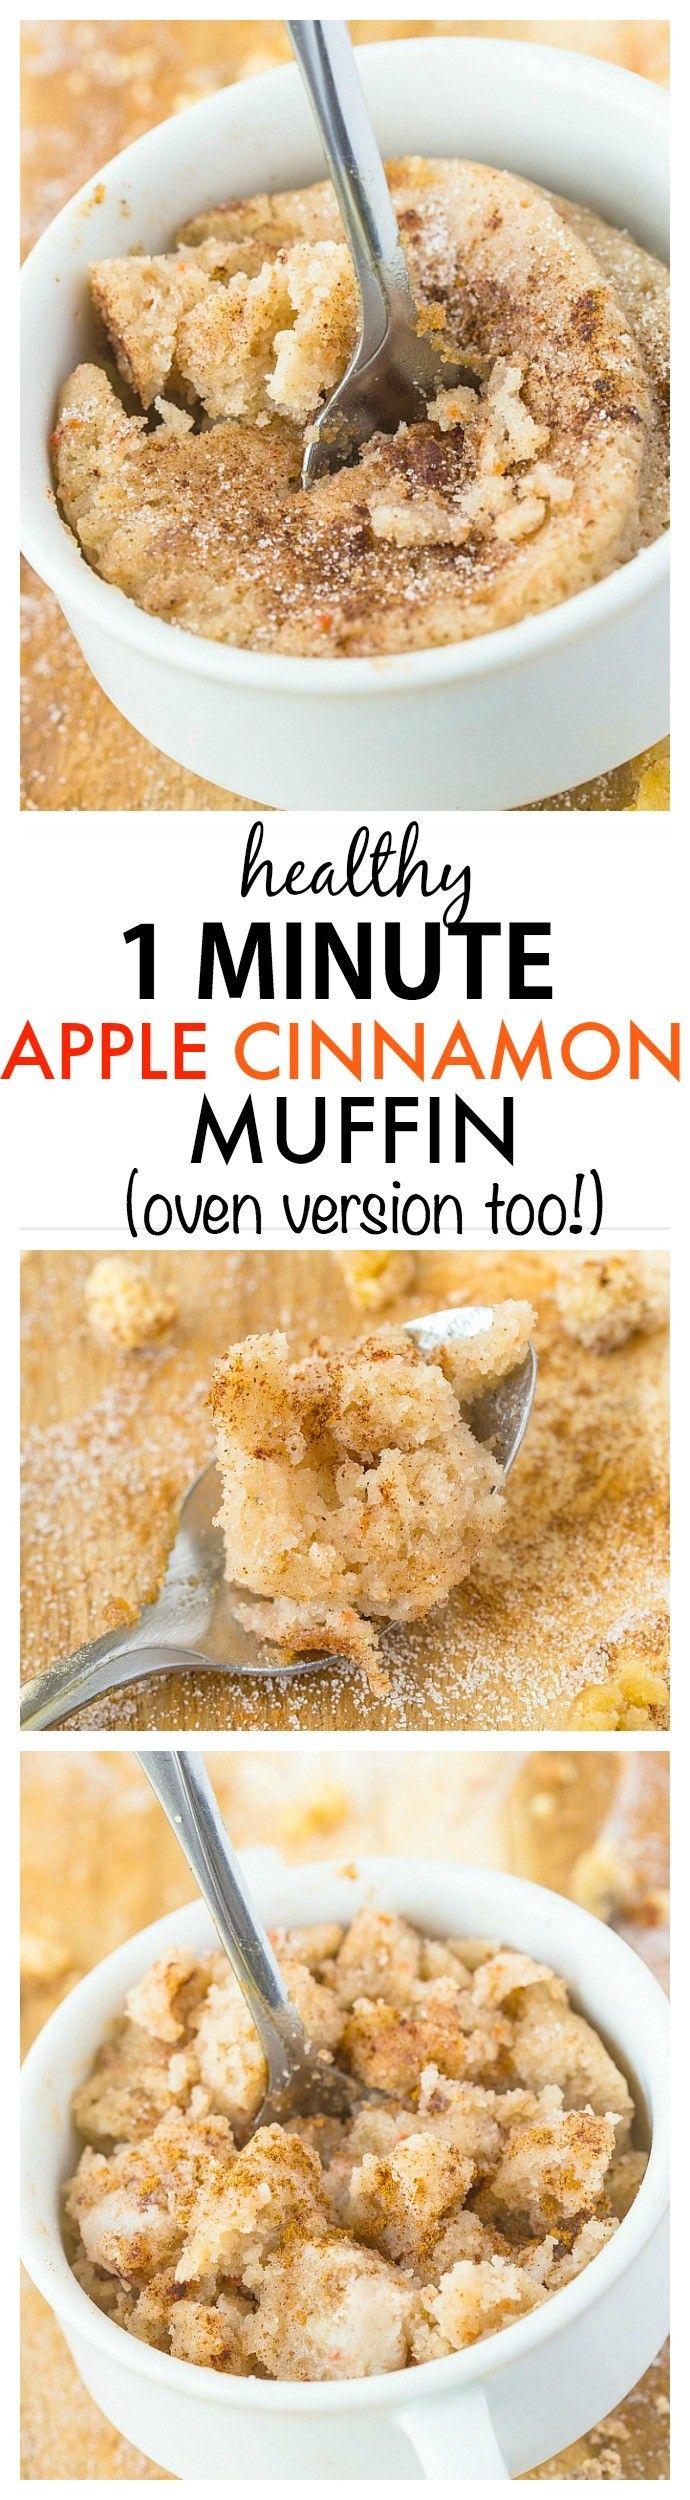 Healthy 1 Minute Apple Cinnamon Muffin